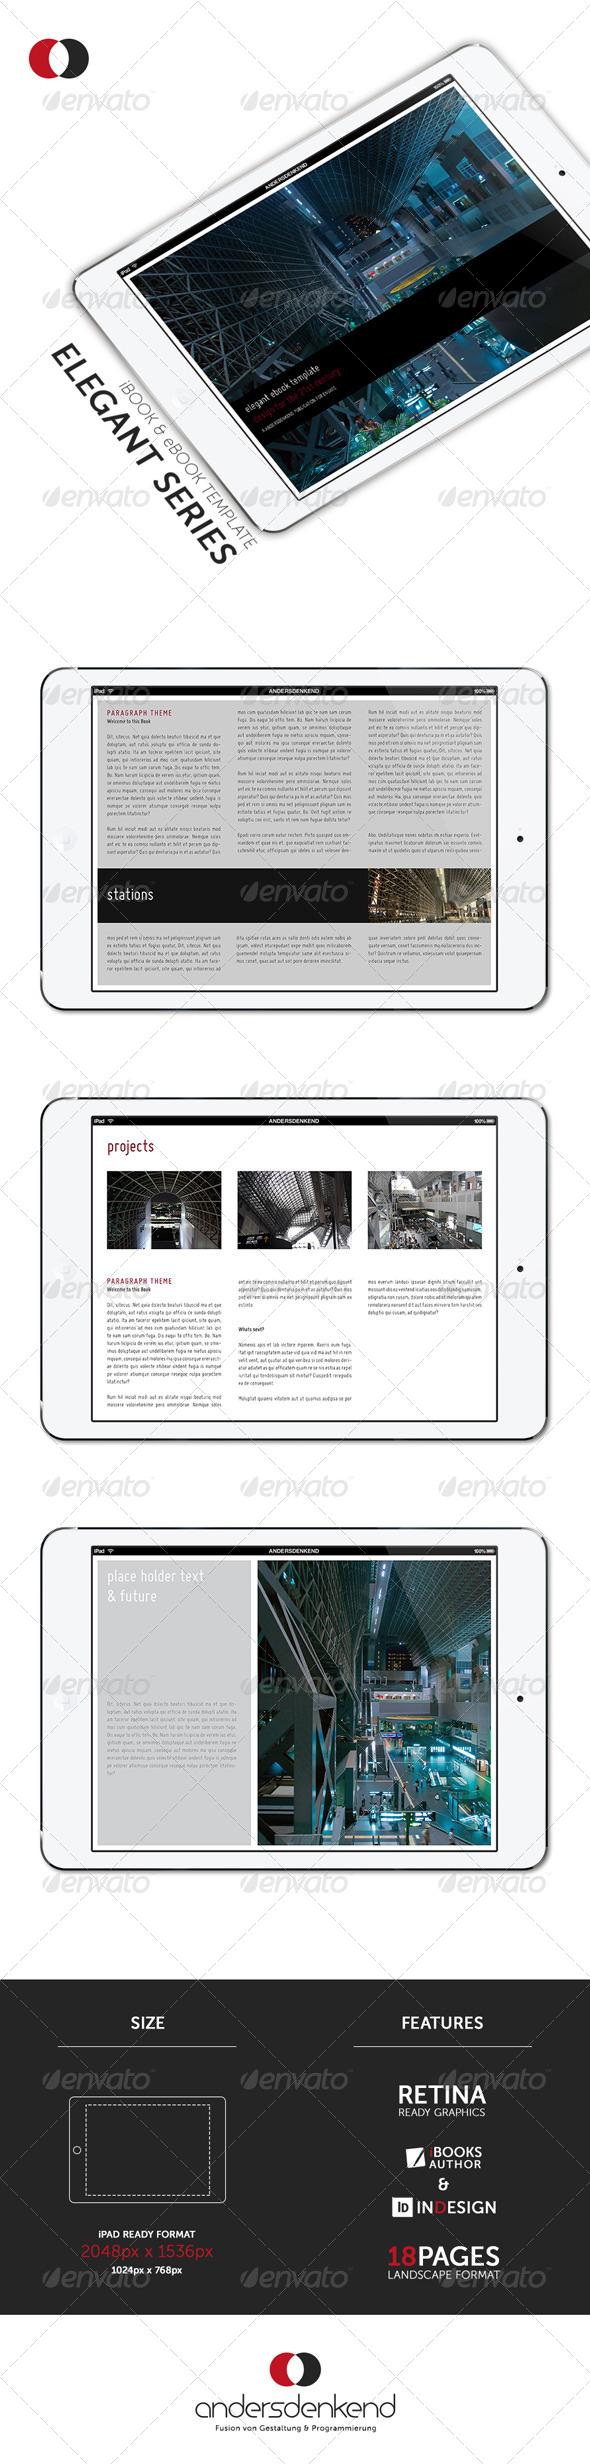 ibook template